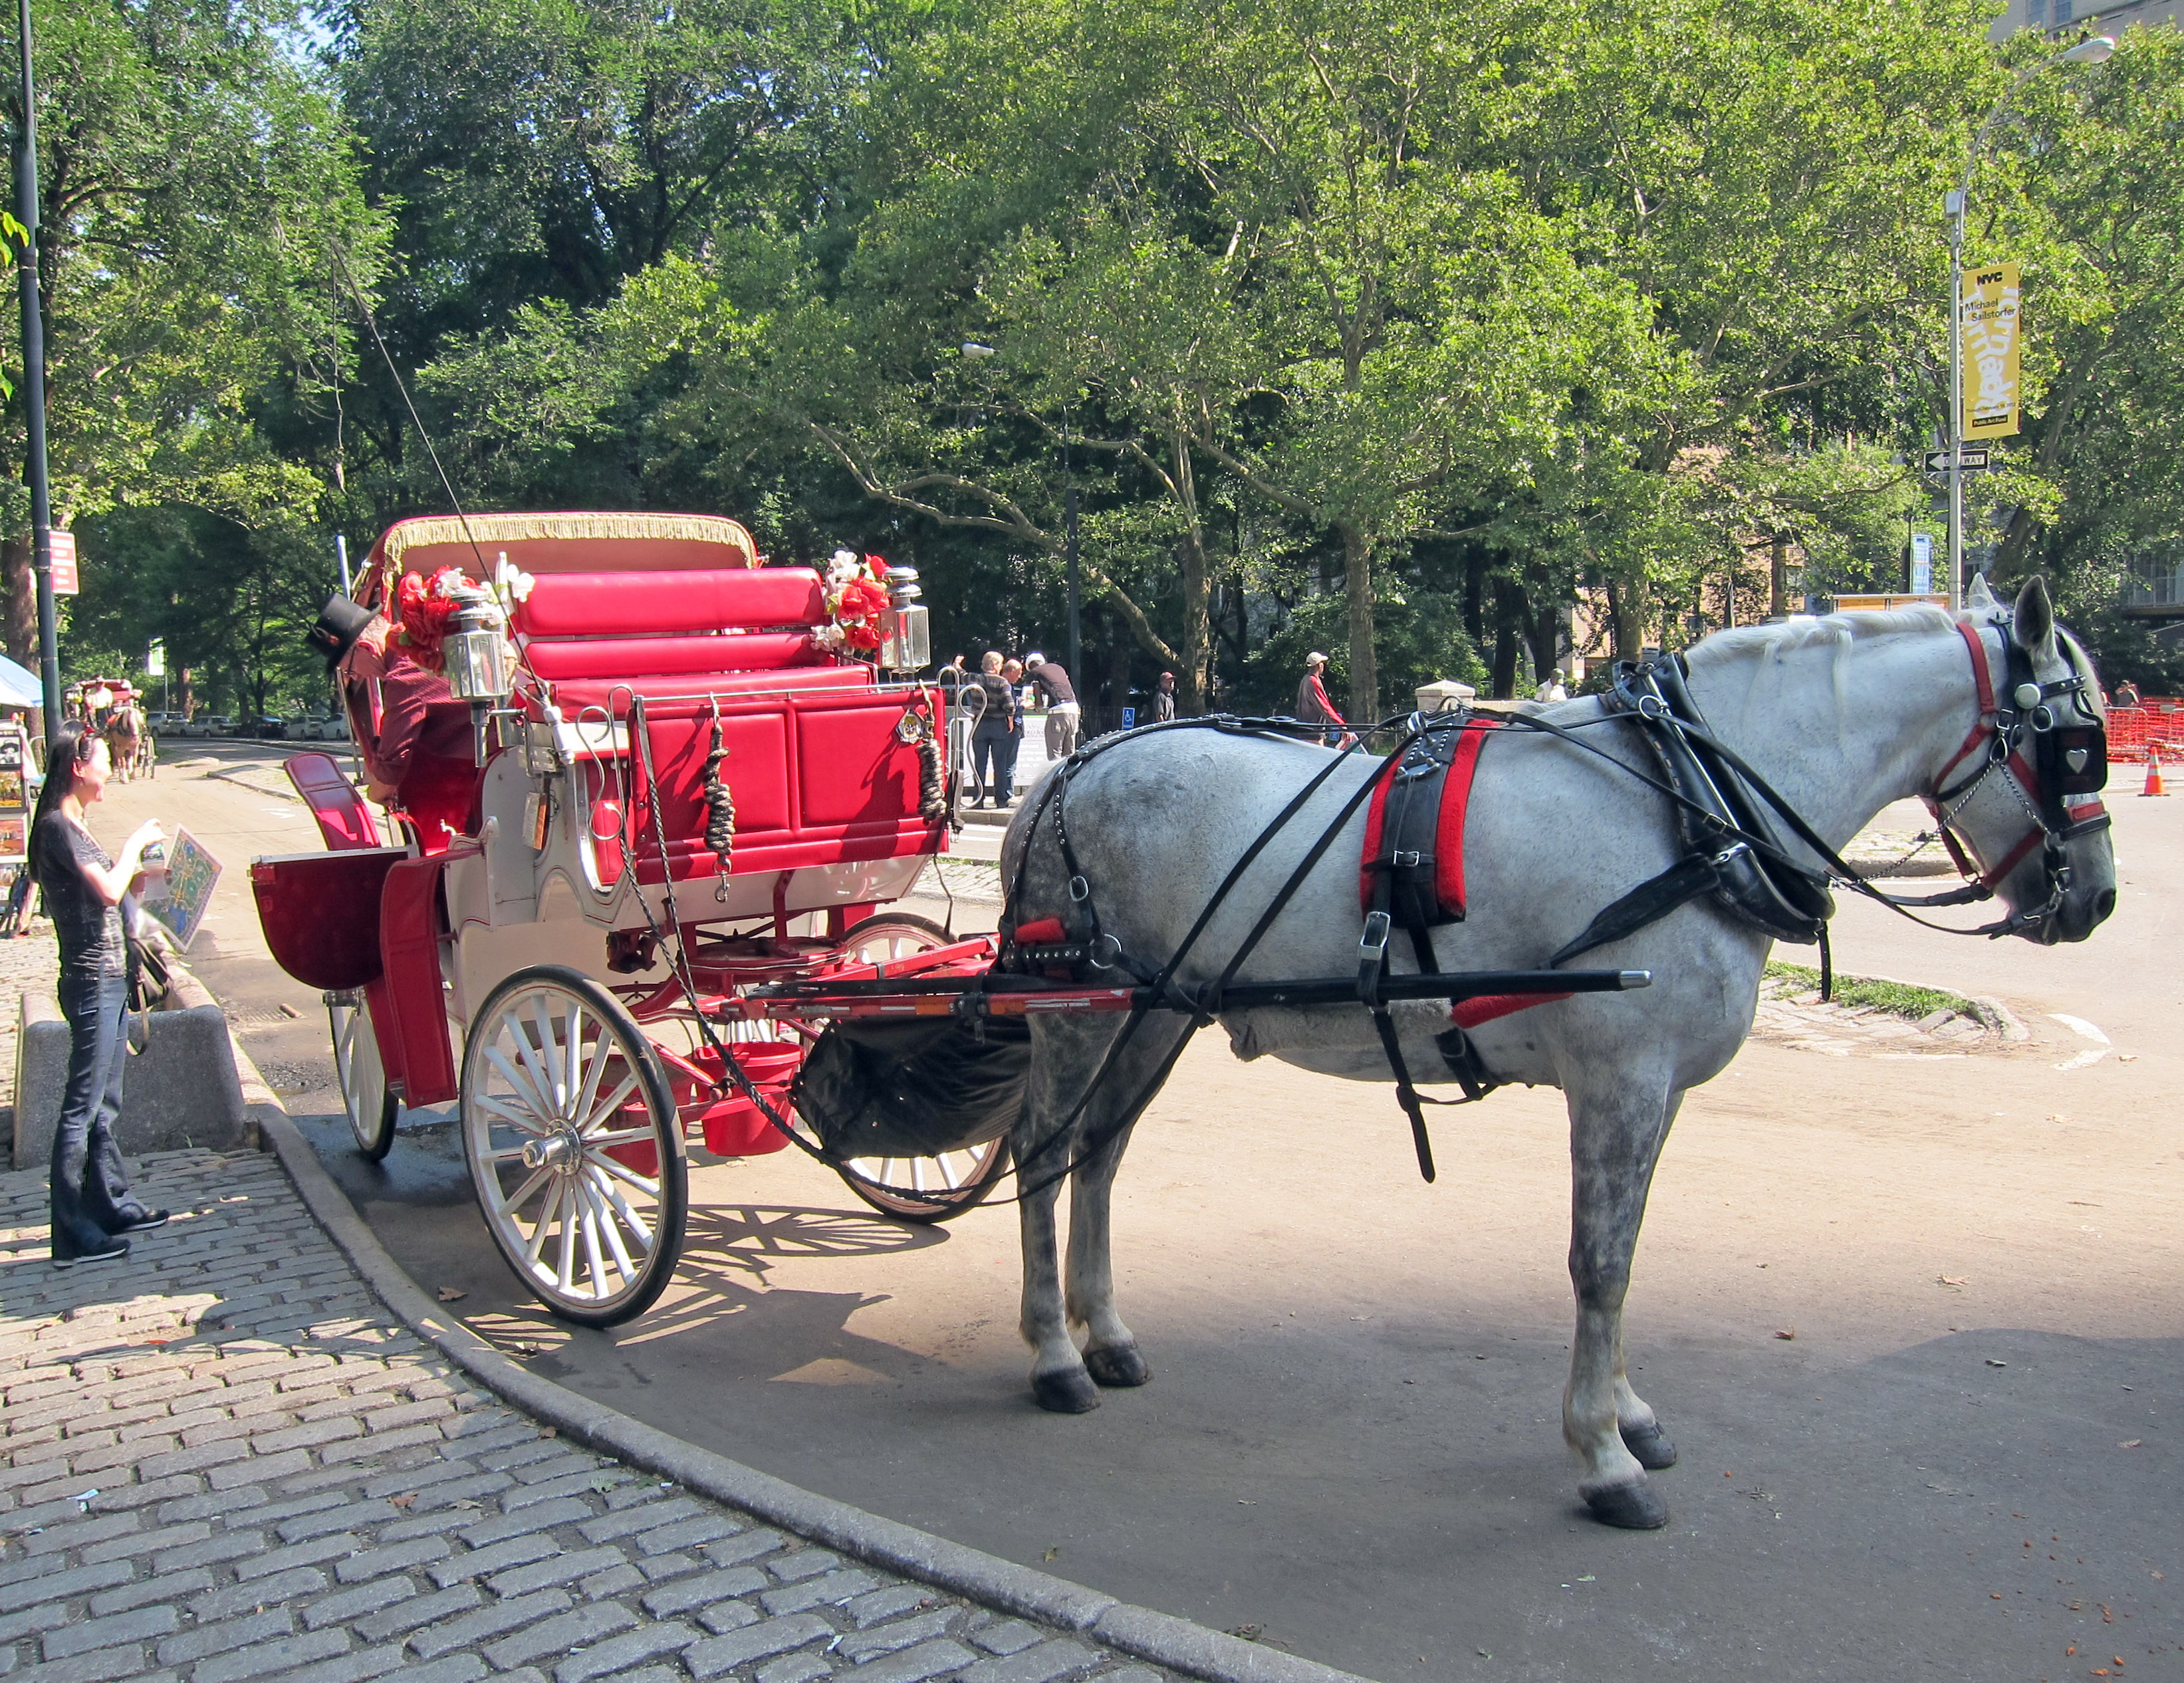 Central Park Nyc Carriage Rides Ride Through Central Park